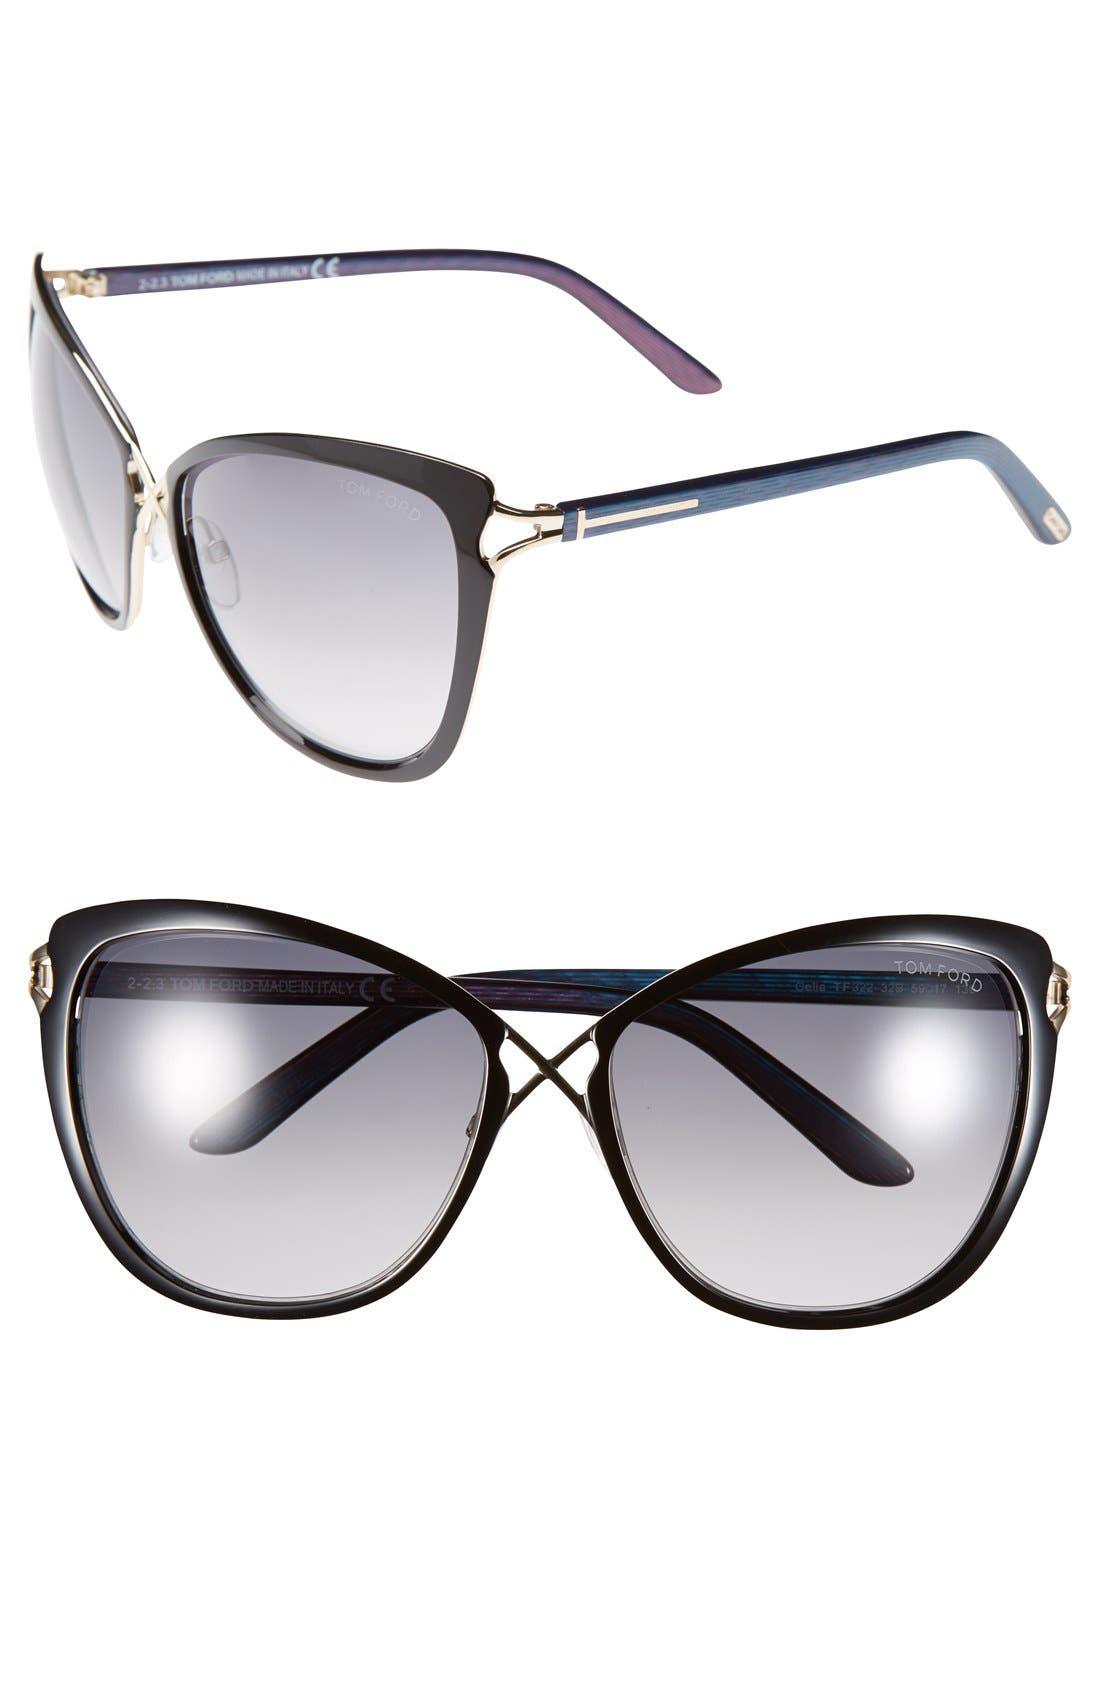 Main Image - Tom Ford 'Celia' 59mm Cat Eye Sunglasses